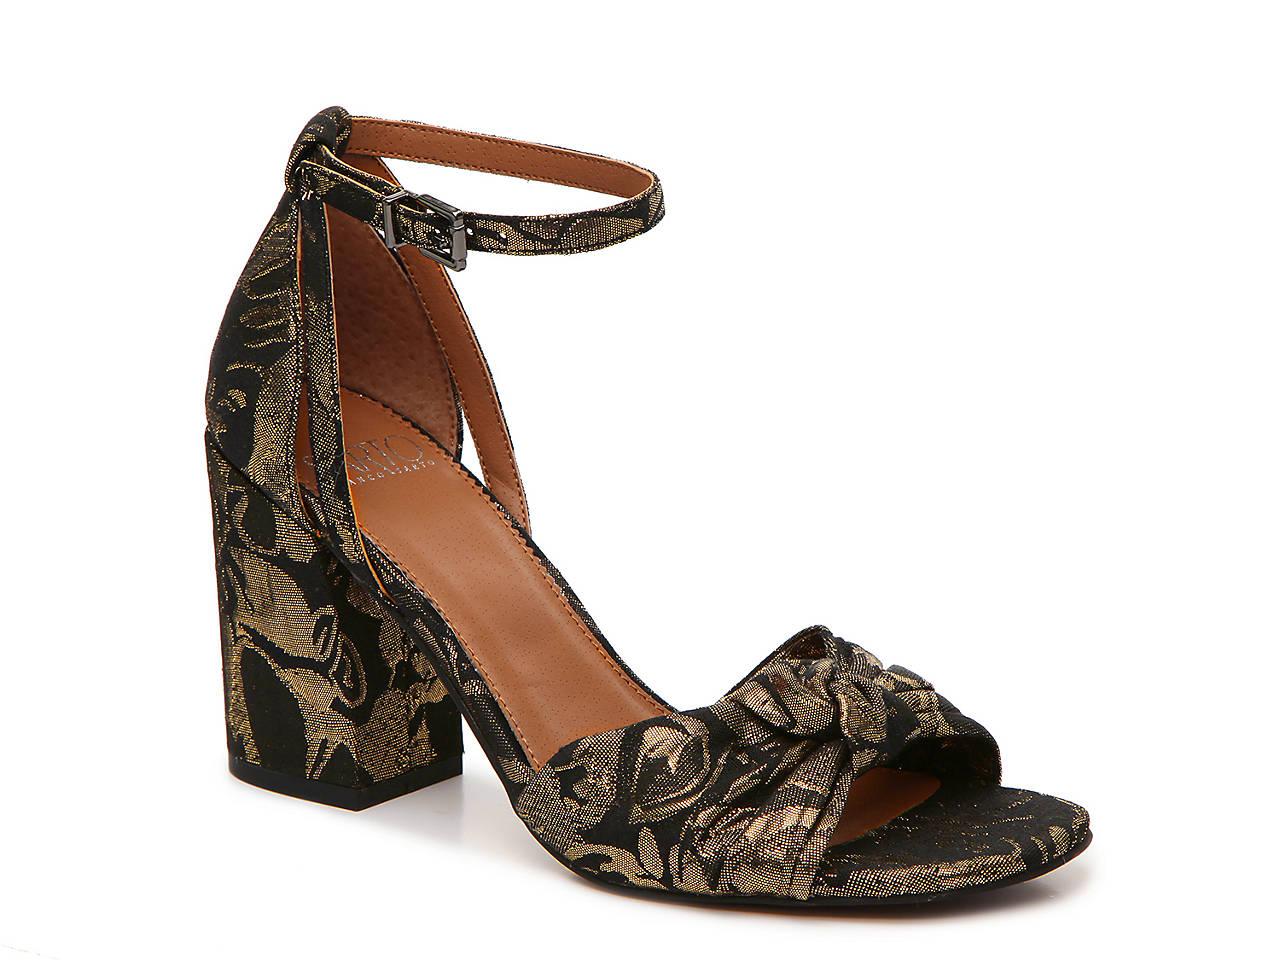 cd067a303fdc SARTO by Franco Sarto Edana Sandal Women s Shoes